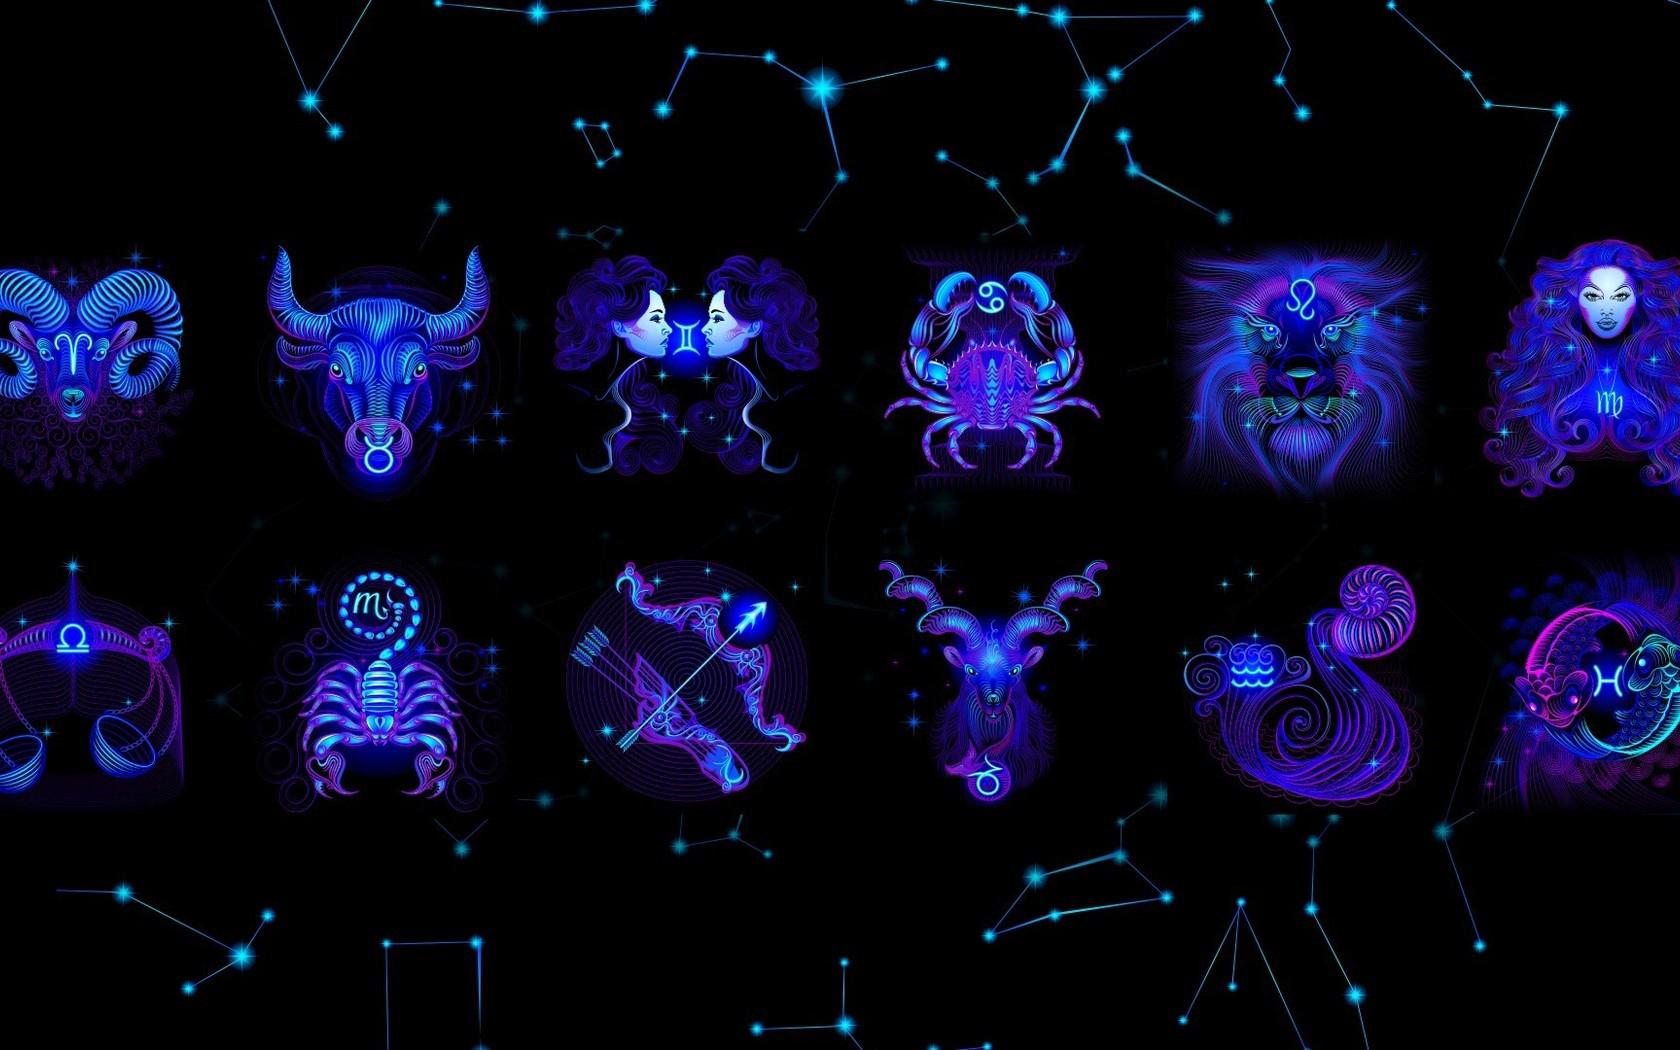 Zodiac signs Desktop Wallpapers FREE on Latorocom 1680x1050